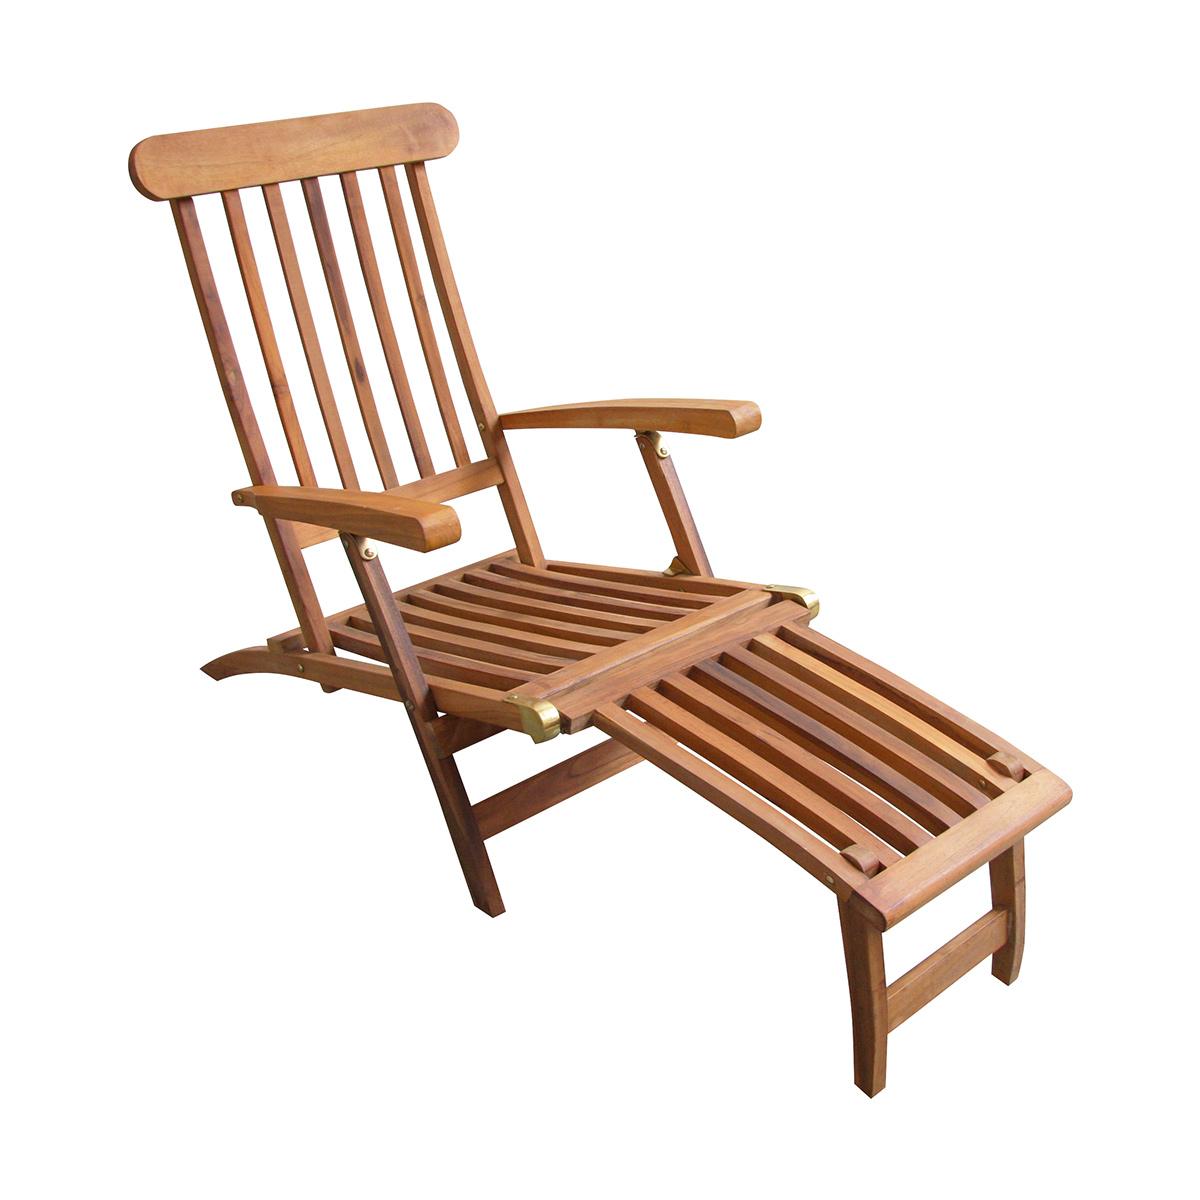 Chaise longue Baya en Teck